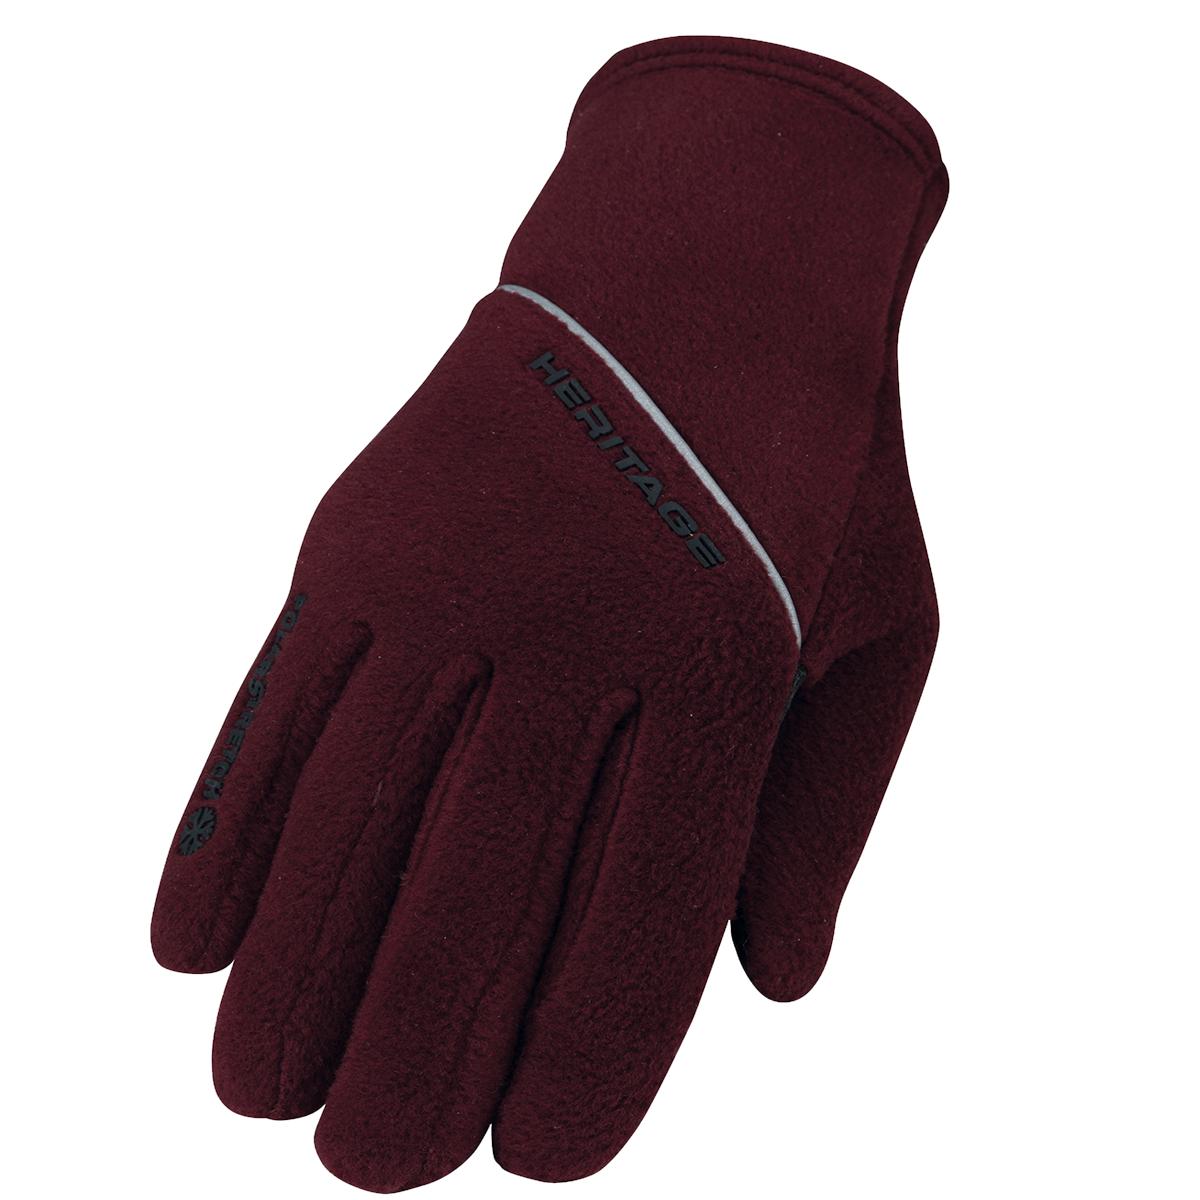 Heritage Heritage Polarstretch Fleece Glove